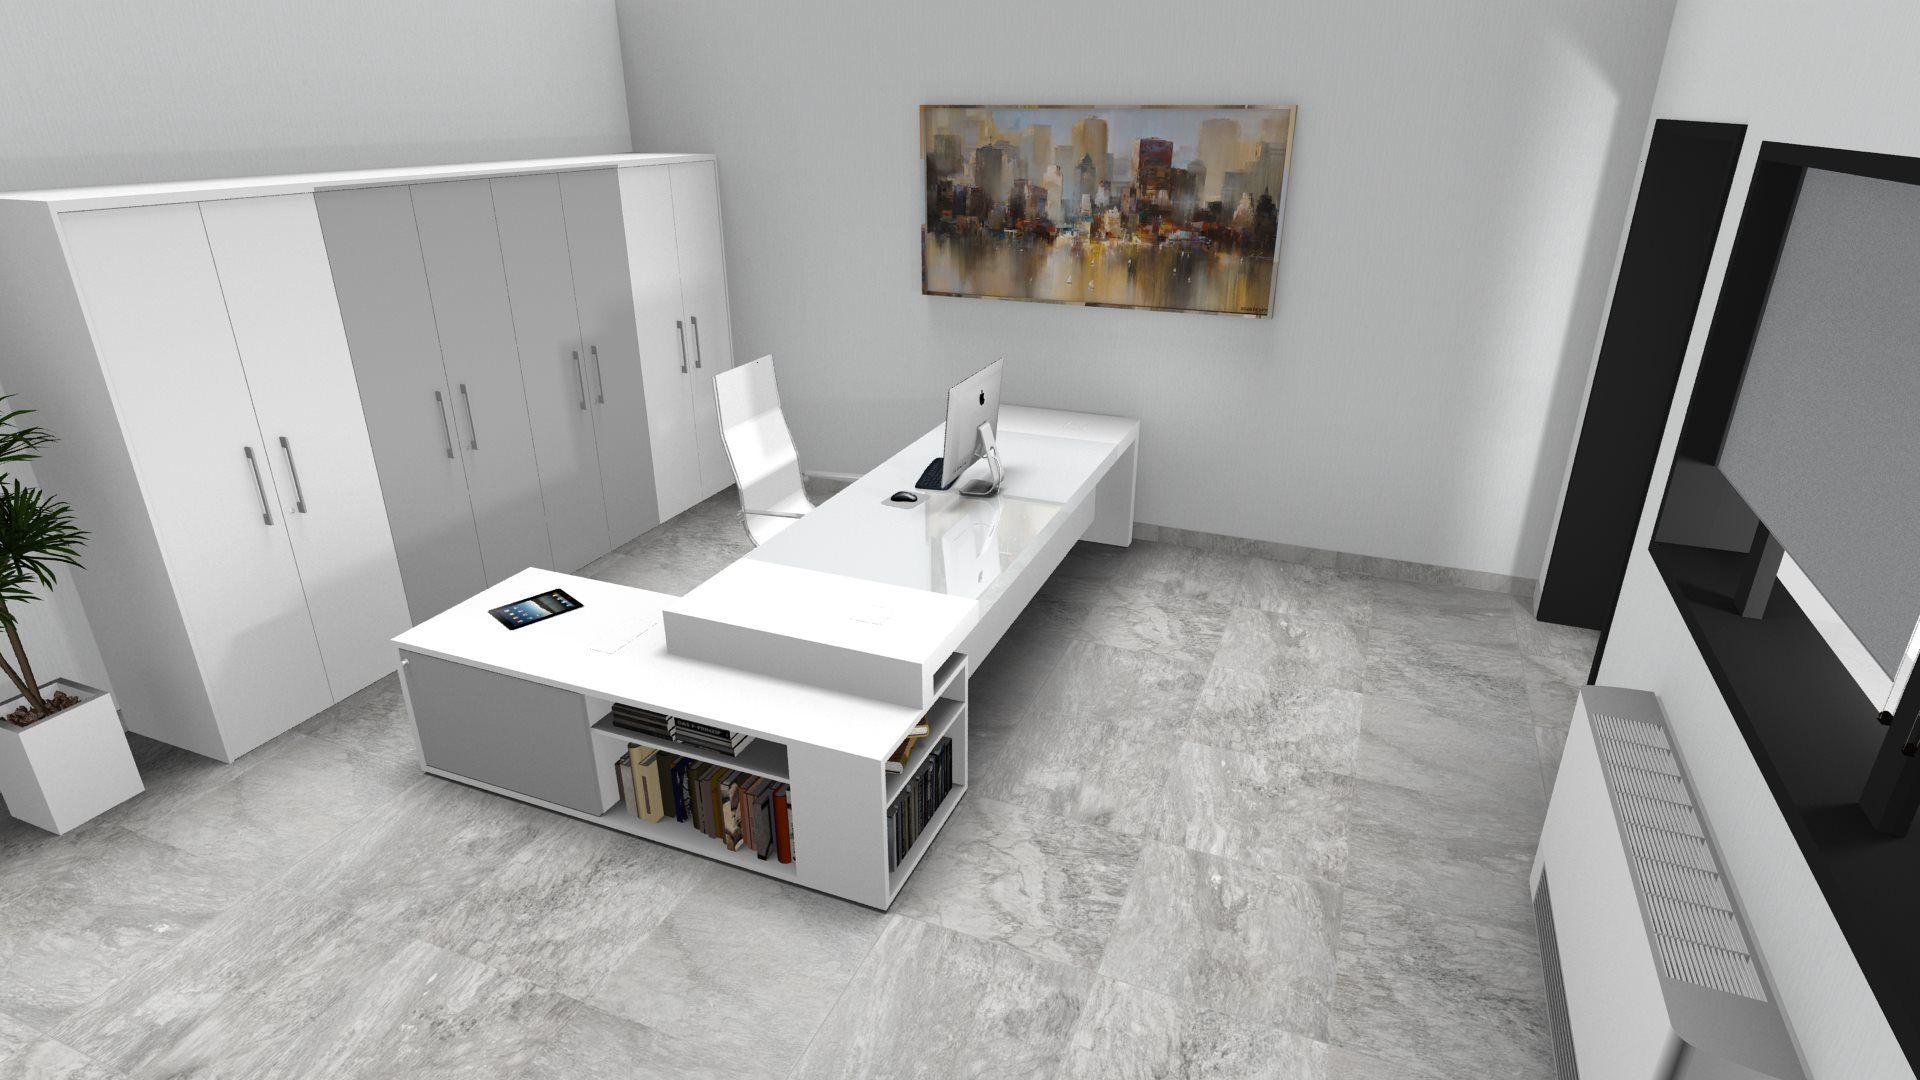 Ufficio Direzionale Bianco : Executive office idea modern interior design restyling idea